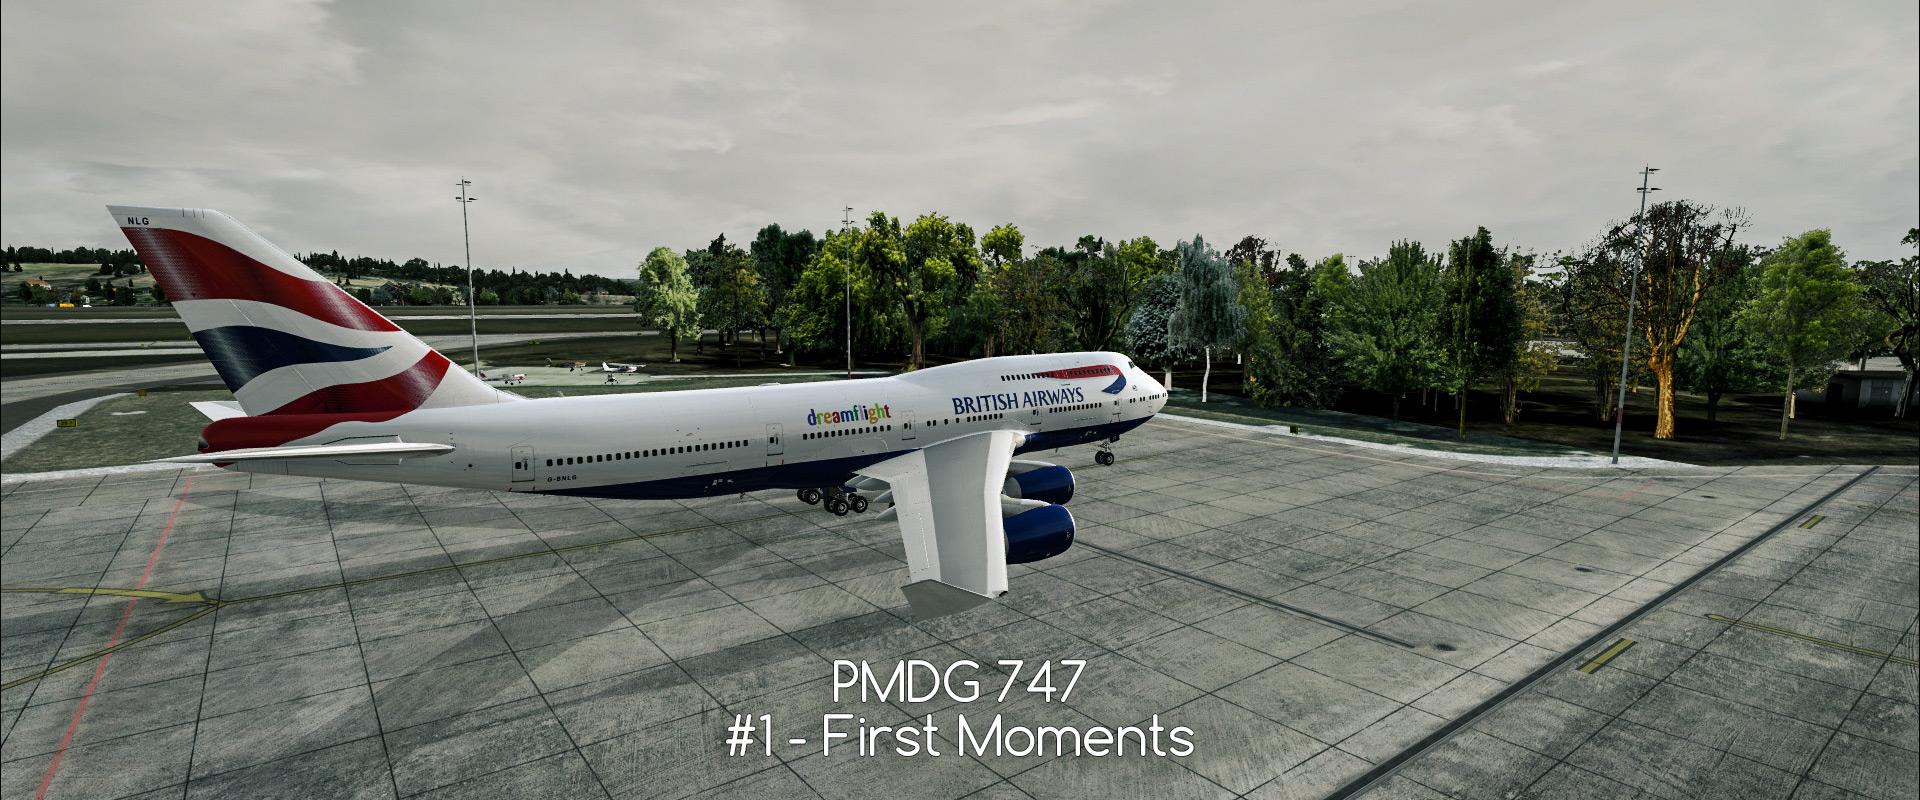 PMDG 747 #1 - my first flight